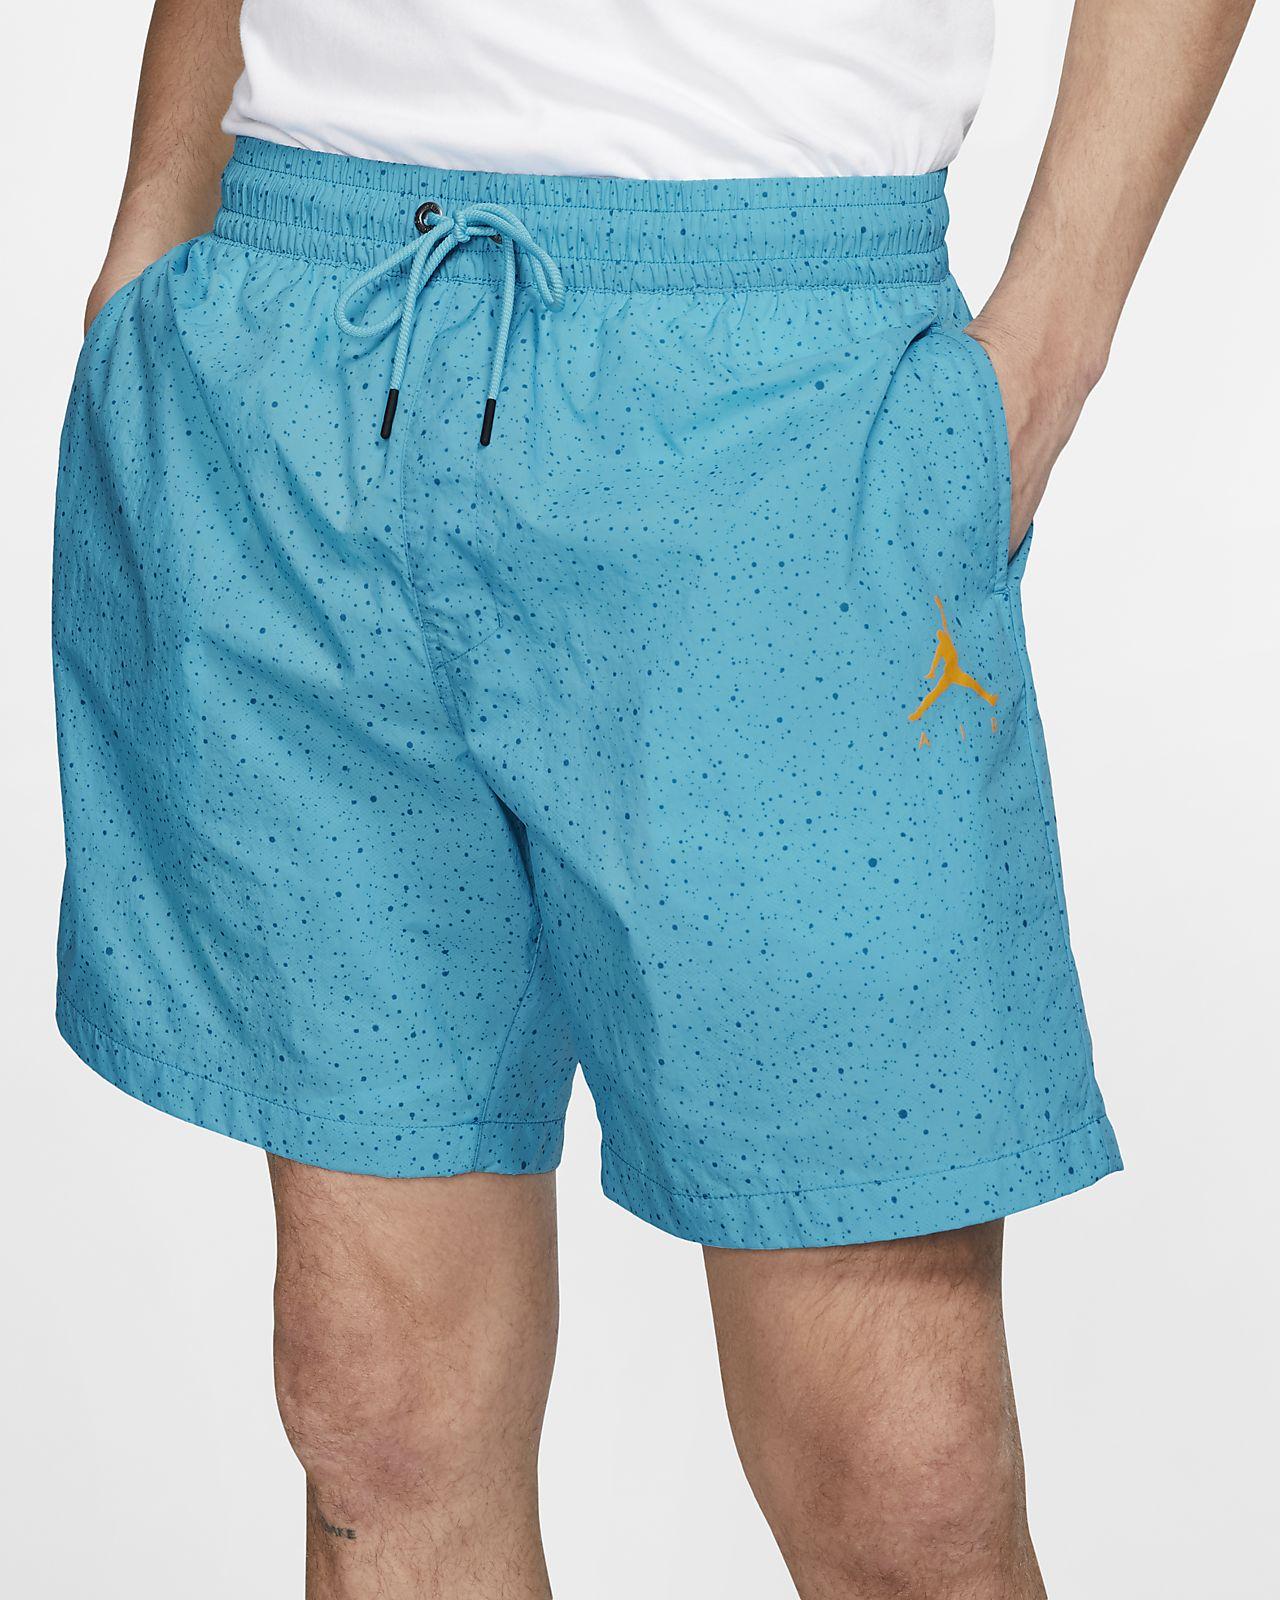 Jordan Jumpman Cement Poolside shorts til herre (18 cm)